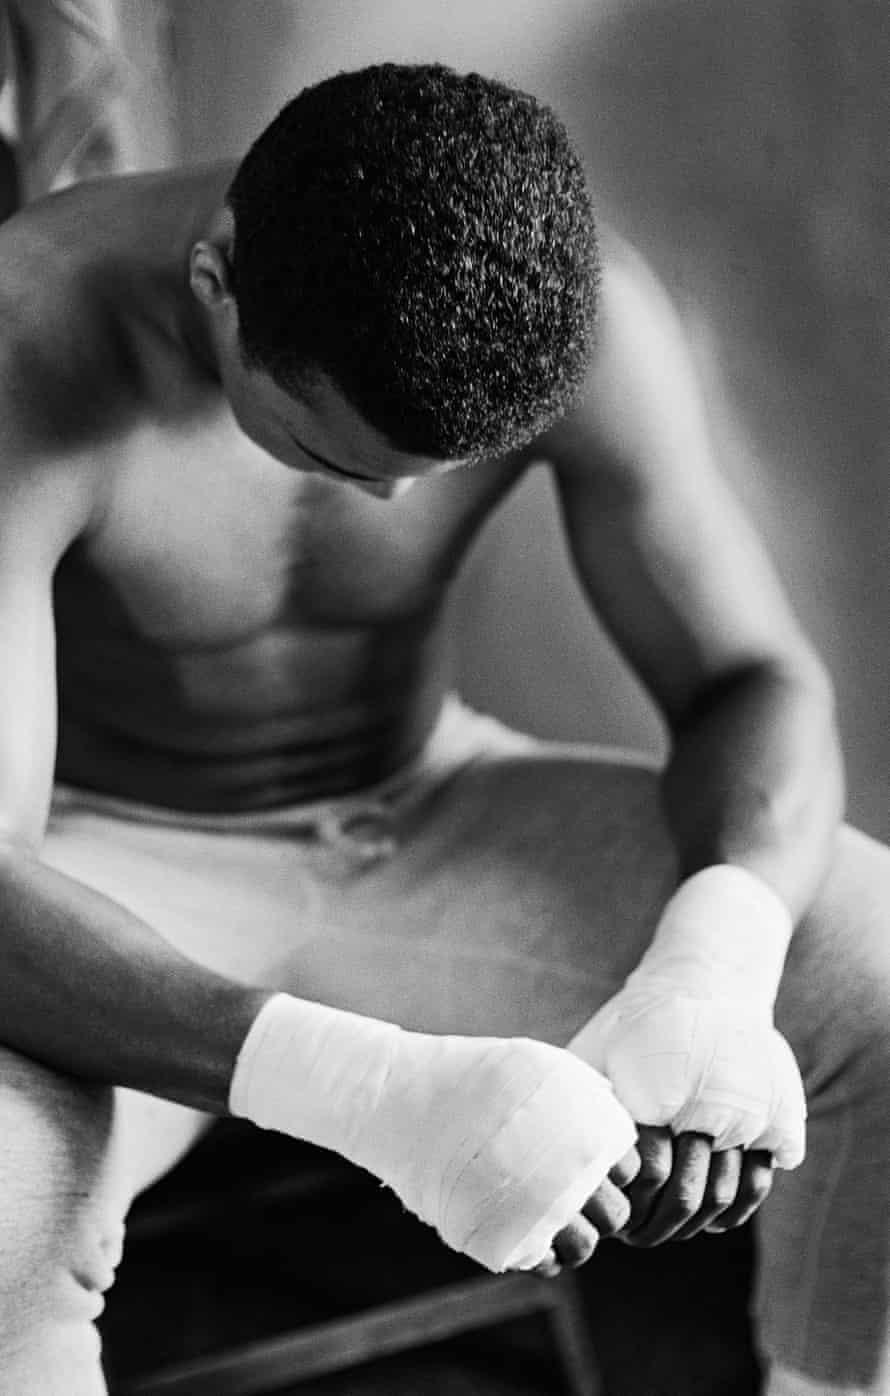 Muhammad Ali in training, Miami Beach, Florida, 1966, by Gordon Parks.